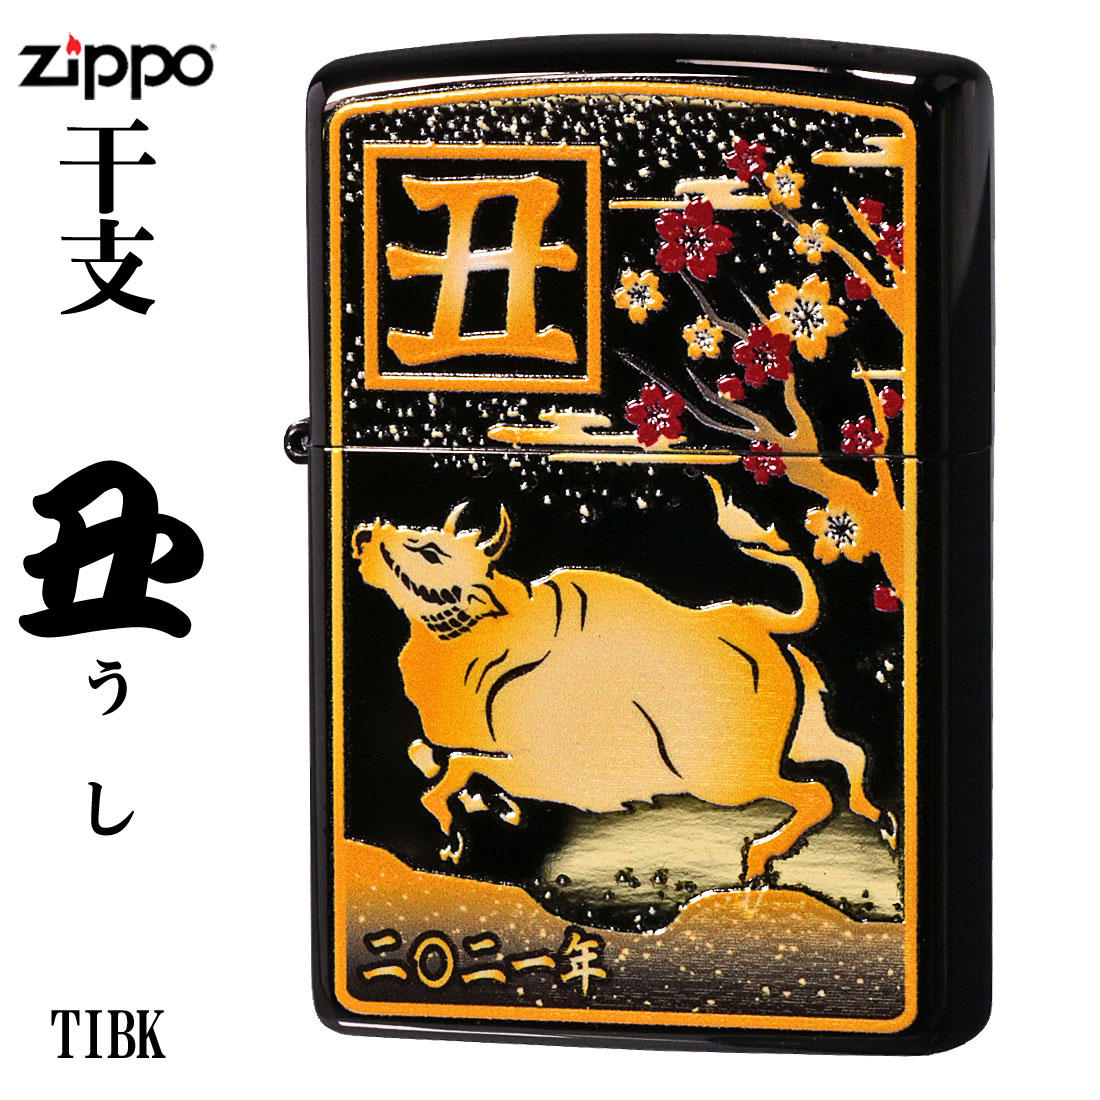 zippo(ジッポーライター)令和三年度干支「丑」  完全受注生産モデル 2TIBK-OX画像